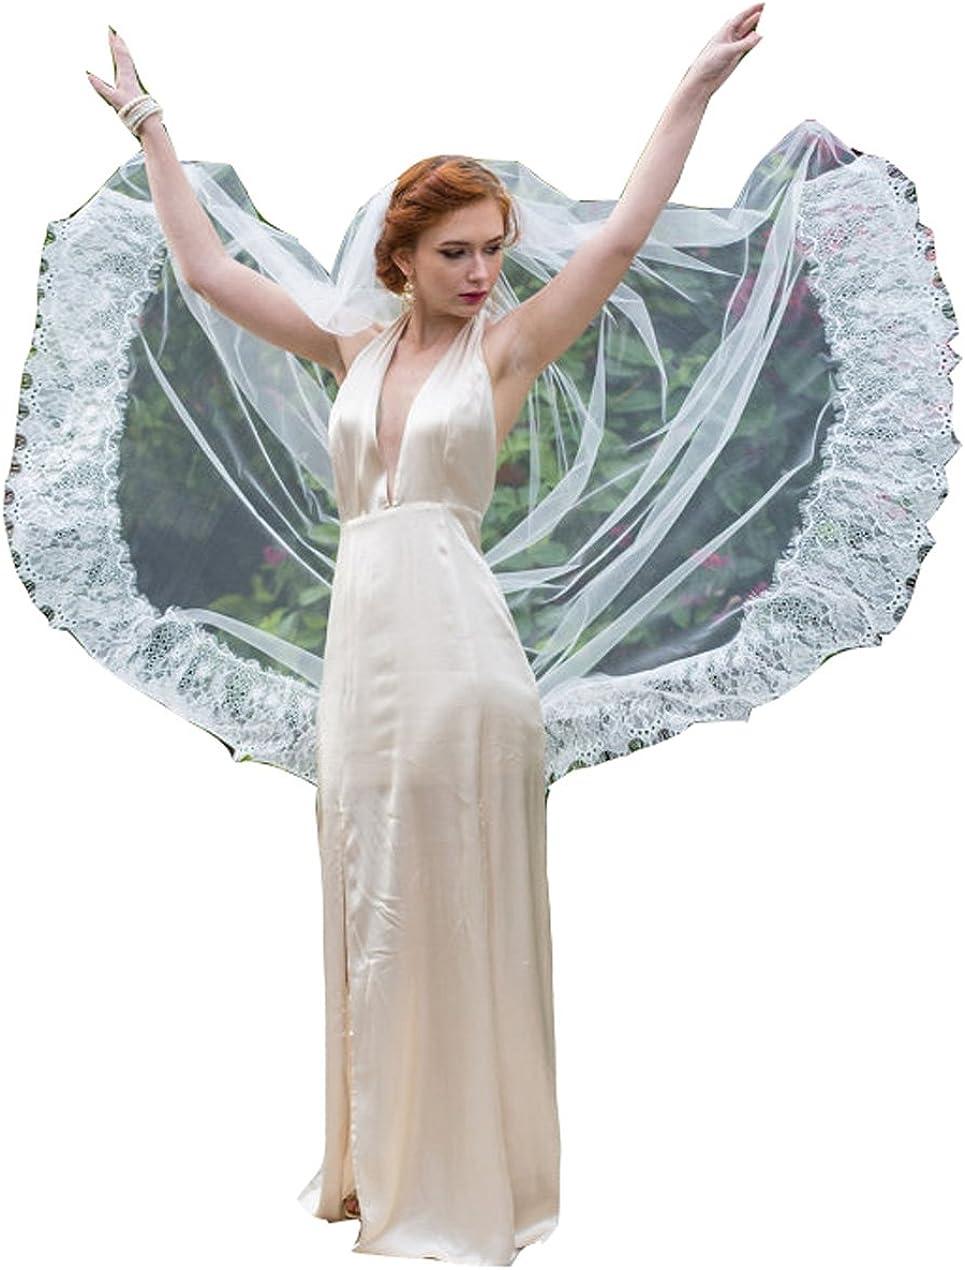 Fenghuavip 1T Wedding Veils Chapel Length Lace Bridal Veils for Women